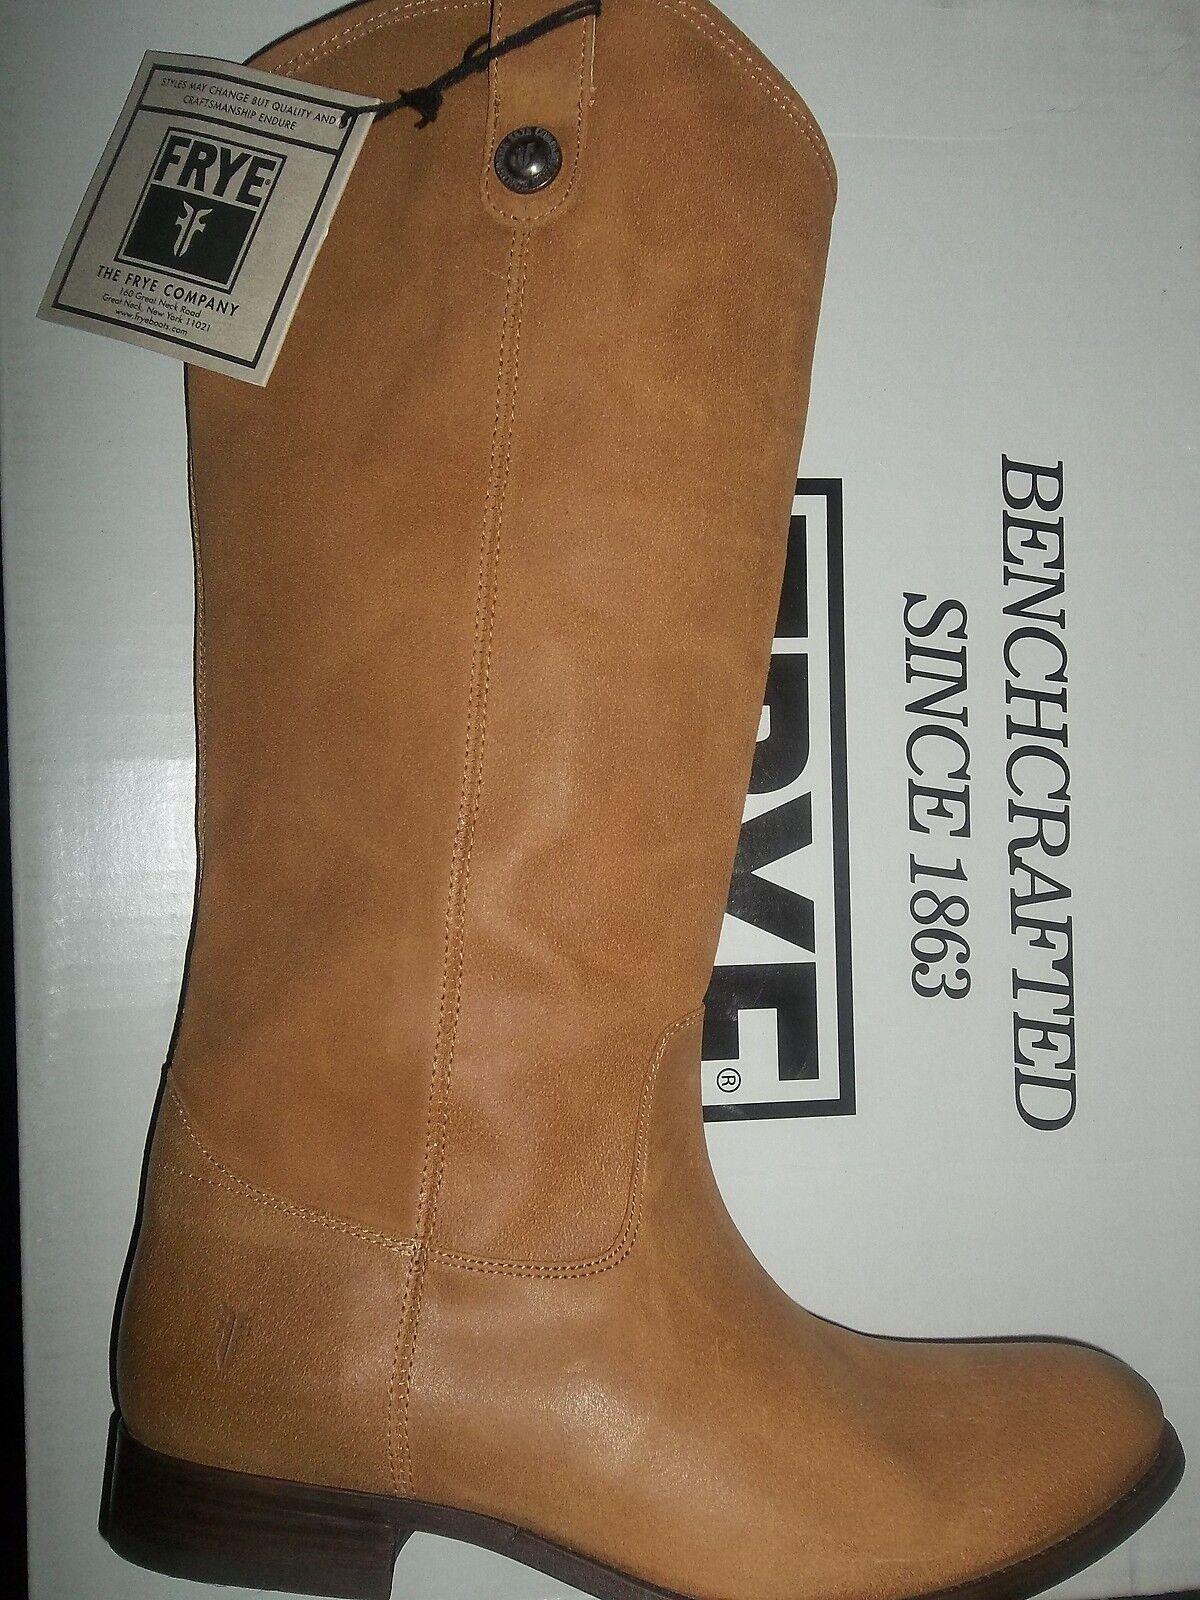 Frye MELISSA BUTTON Cowboy Western Leather Boots  77162 Tan Tan 11M M Women New